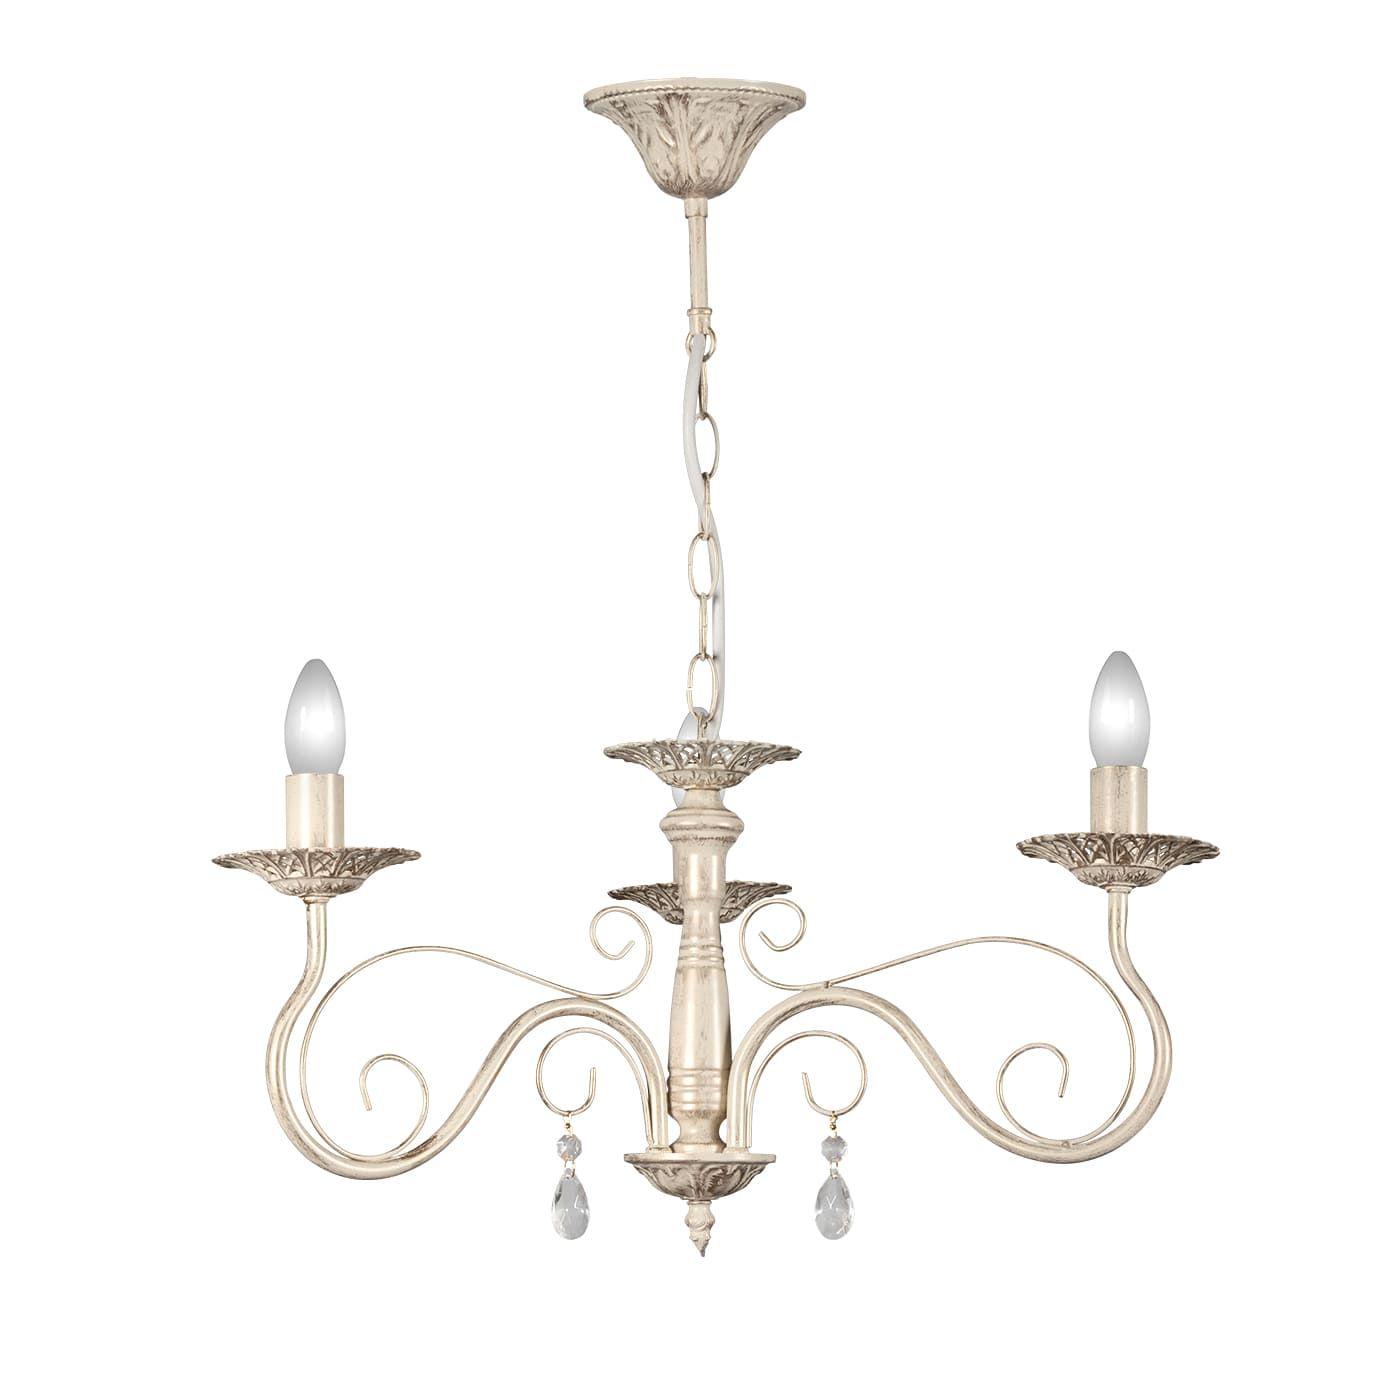 PETRASVET / Pendant chandelier S1020-3, 3xE14 max. 60W